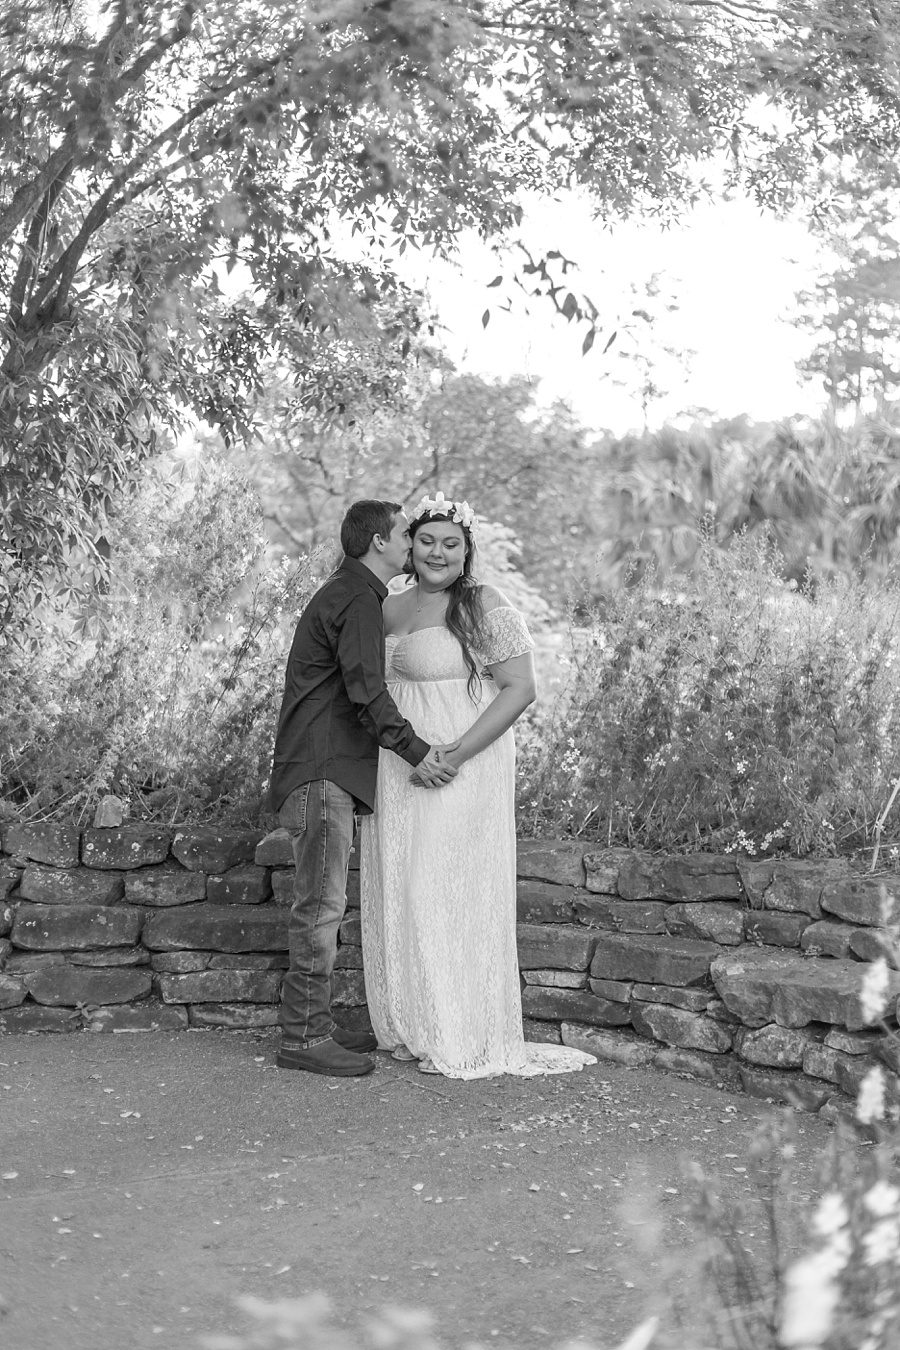 romantic couples maternity portraits at mercer arboretum in houston texas